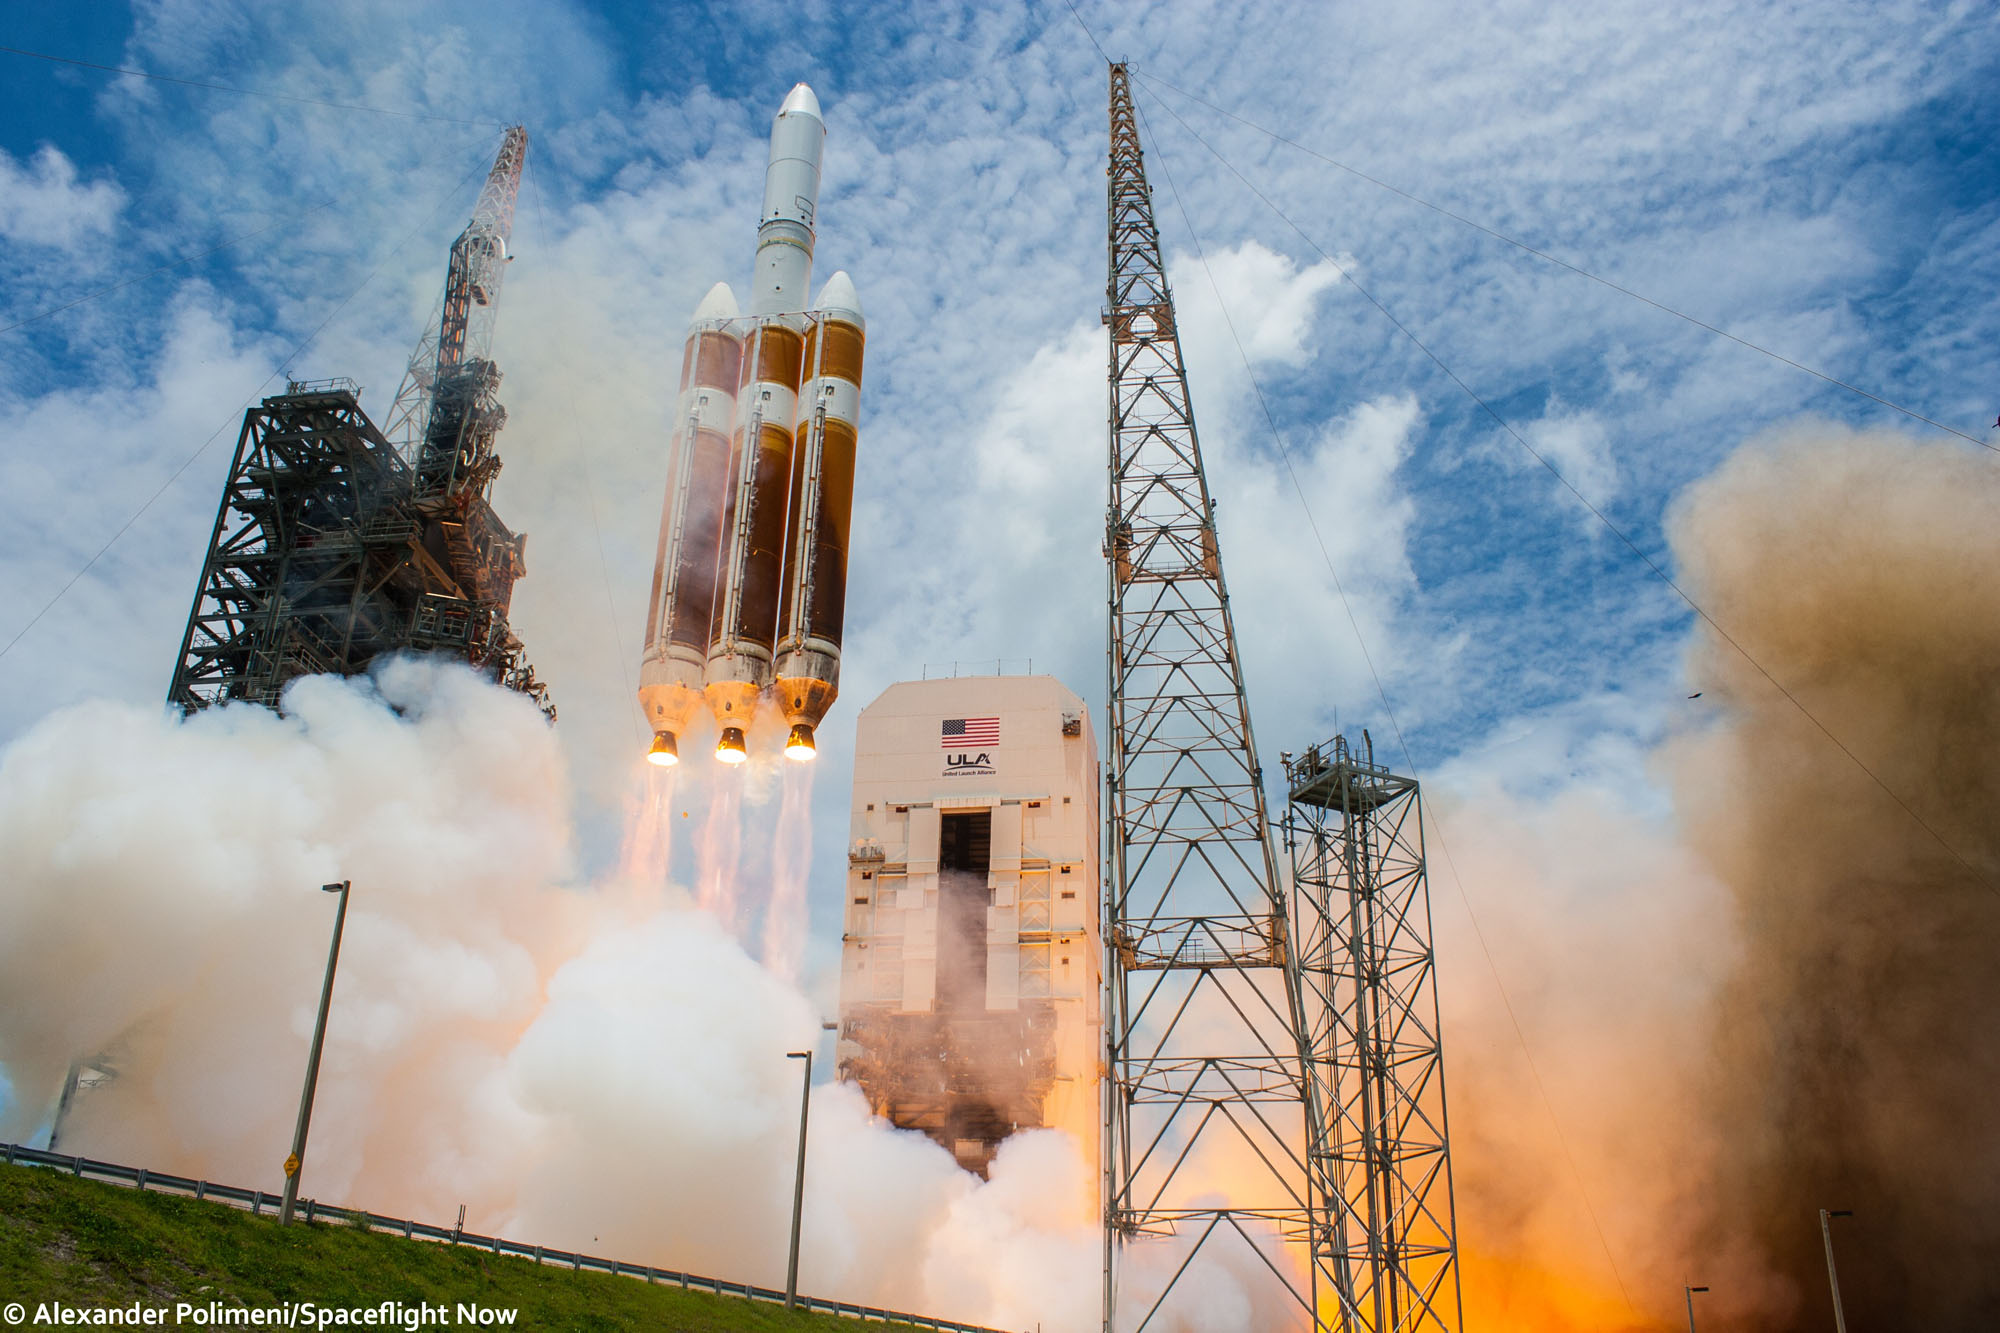 Iamtheeyeinthesky August 2013 ( Aug. 2013 httpswww.nasaspaceflight.com201308ula-delta-iv-h-launch-nrol-65 ) NROL 13